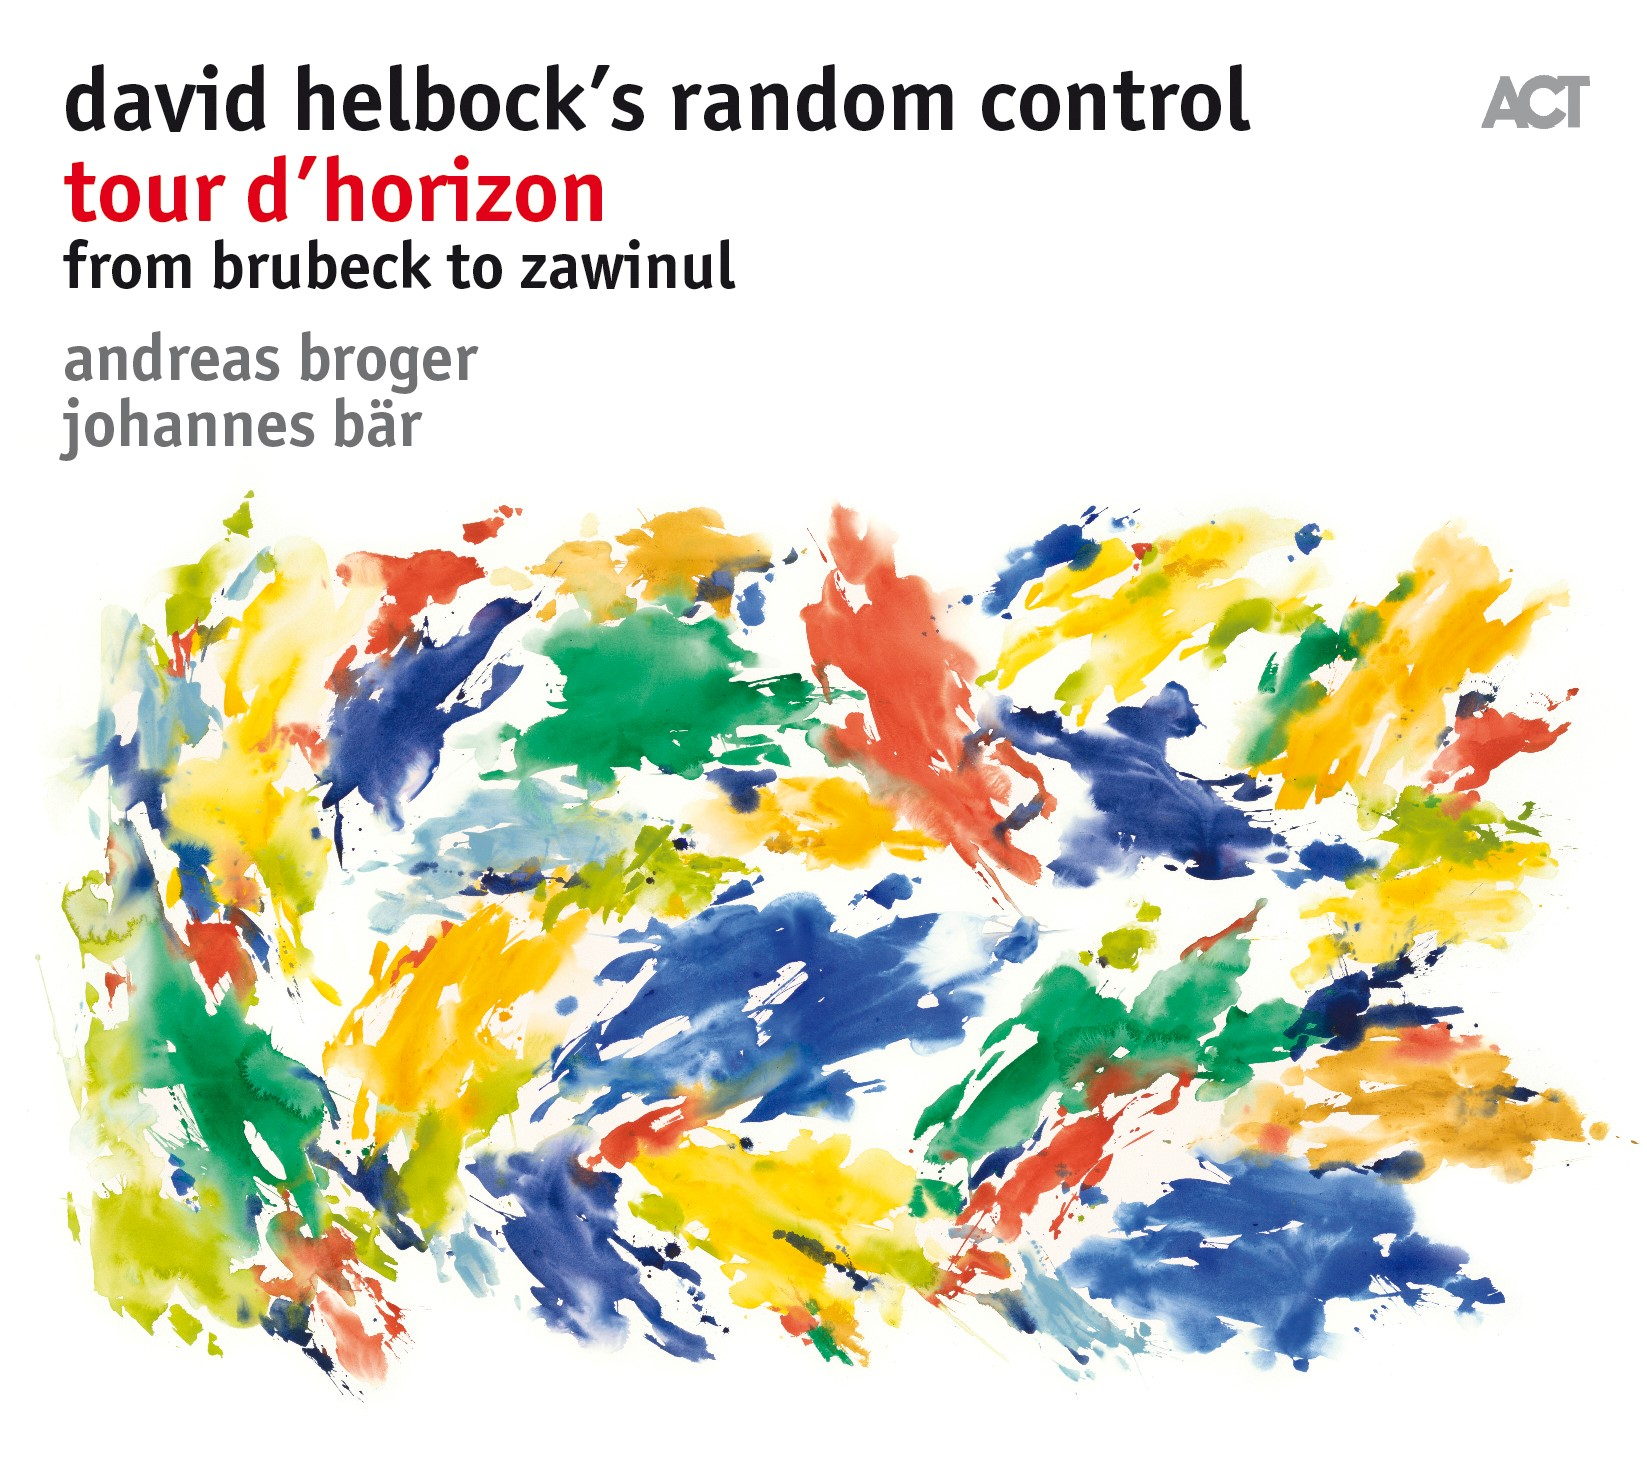 http://downbeat.com/images/reviews/david_helbock.jpg